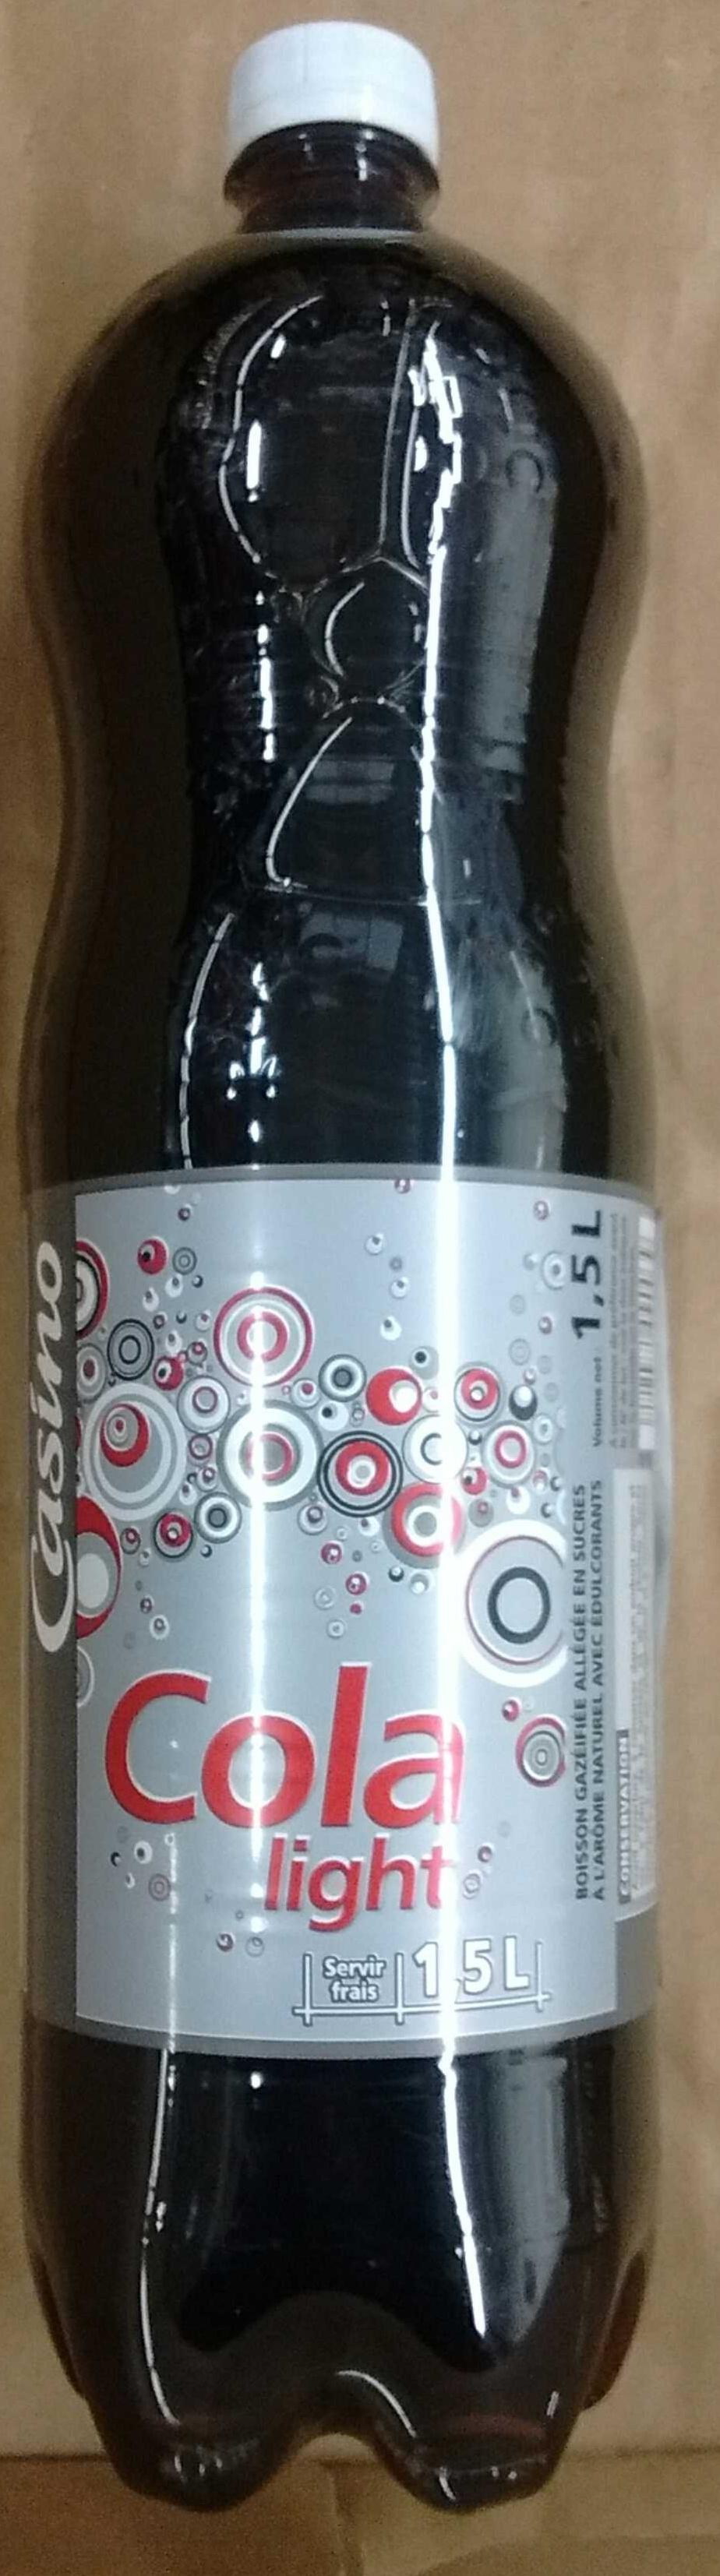 Cola light - Product - fr